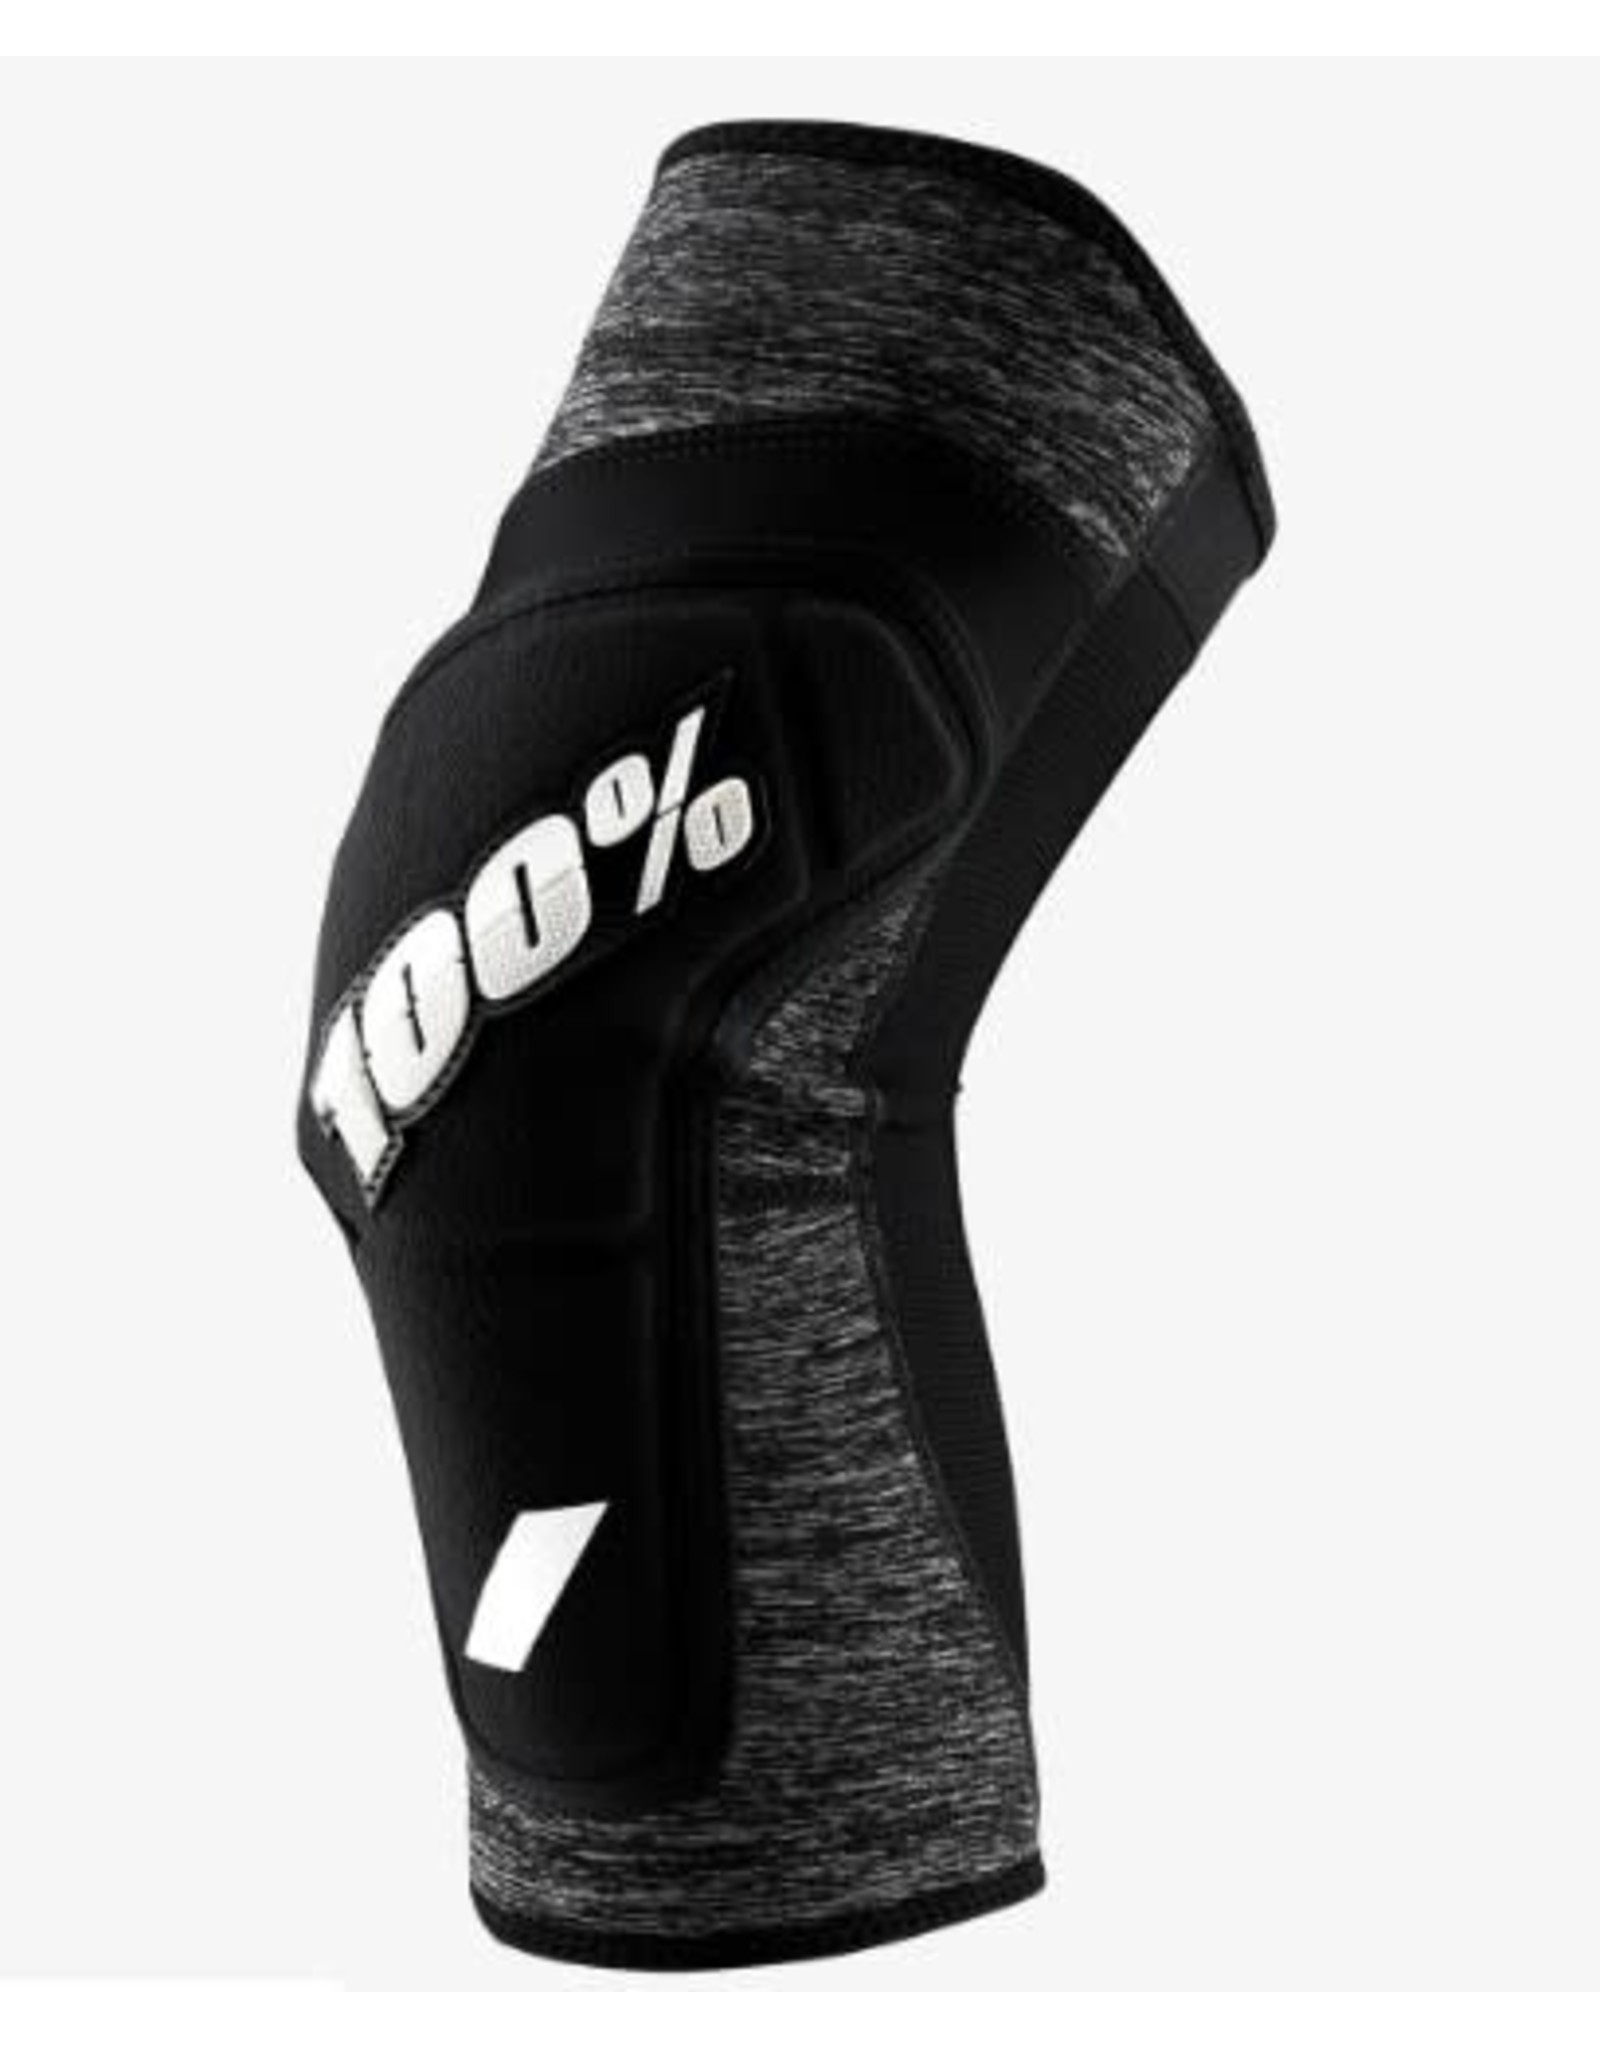 100% Protège-genoux 100% RideCamp